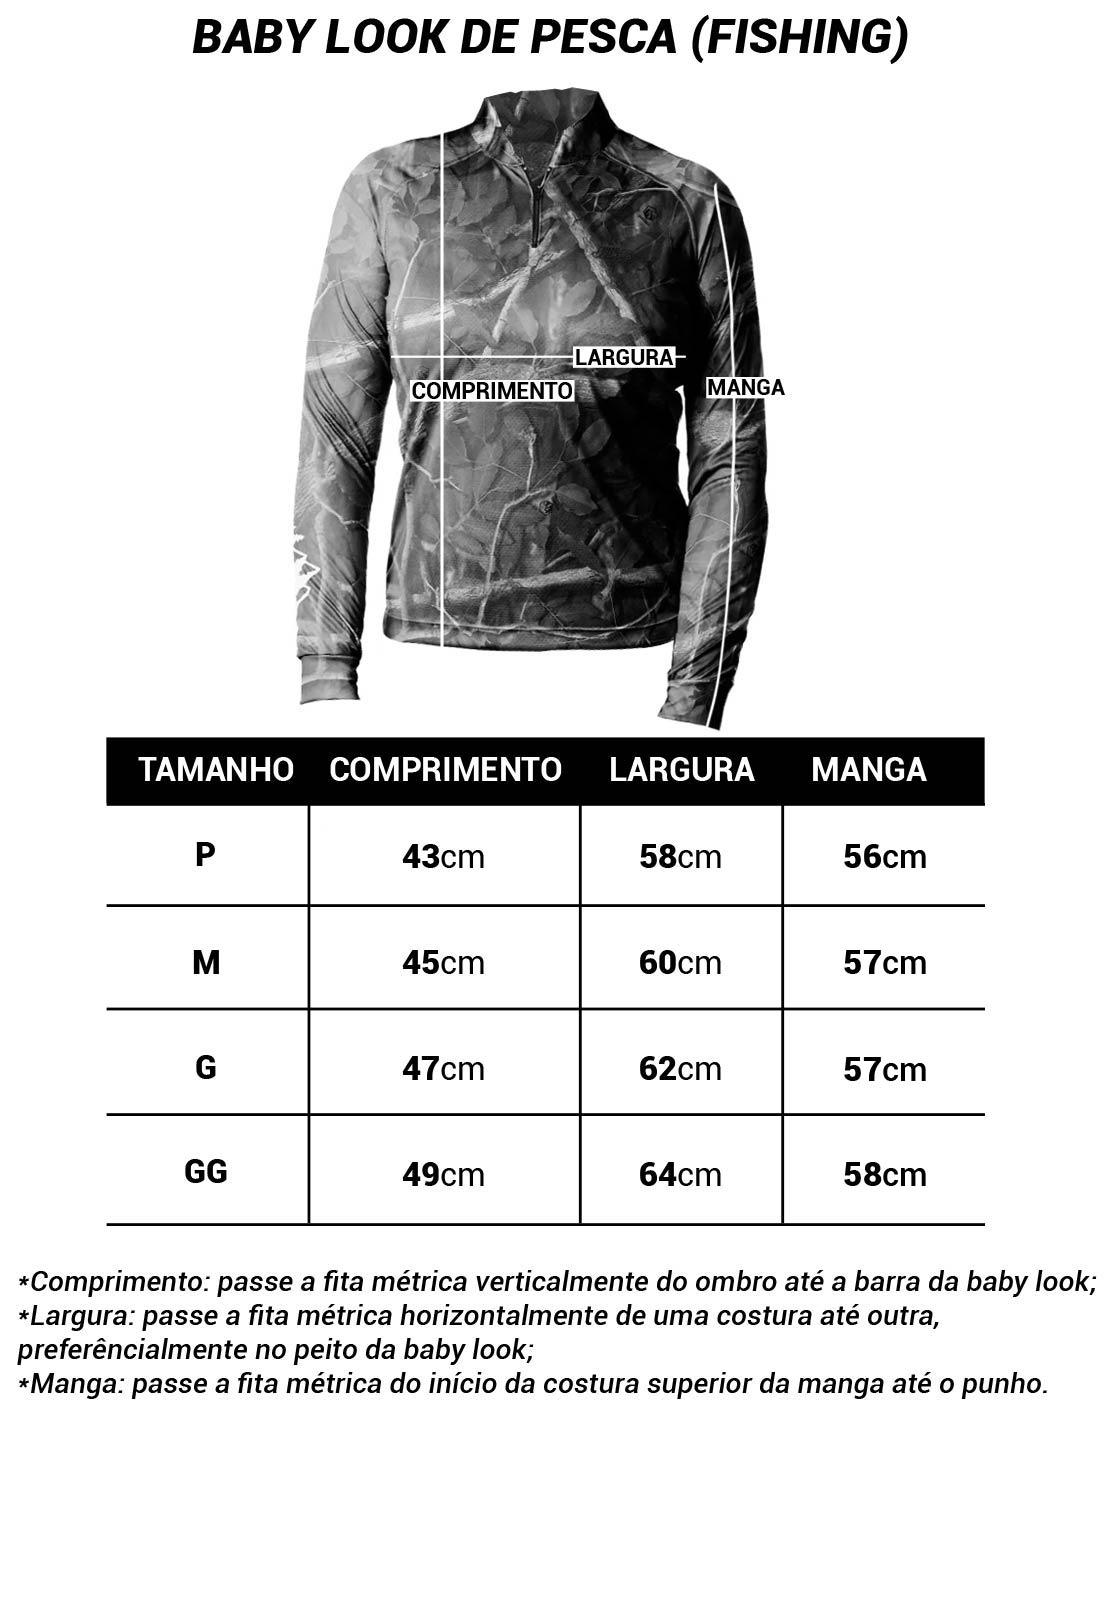 CAMISA DE PESCA FISH TECH PRO 23 FEMININA + BANDANA GRÁTIS  - REAL HUNTER OUTDOORS